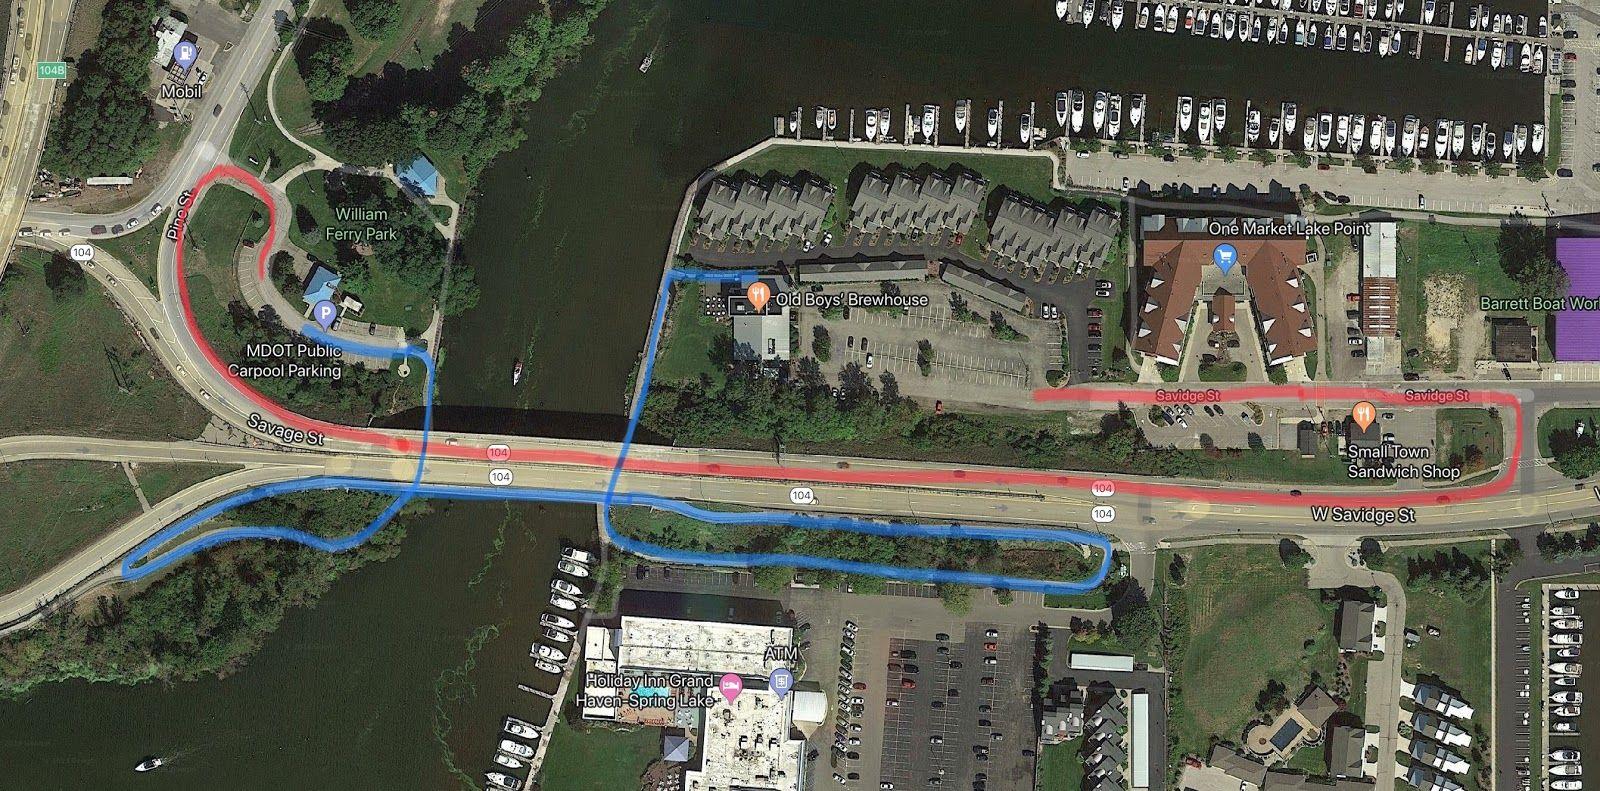 William Ferry Park Parking Map